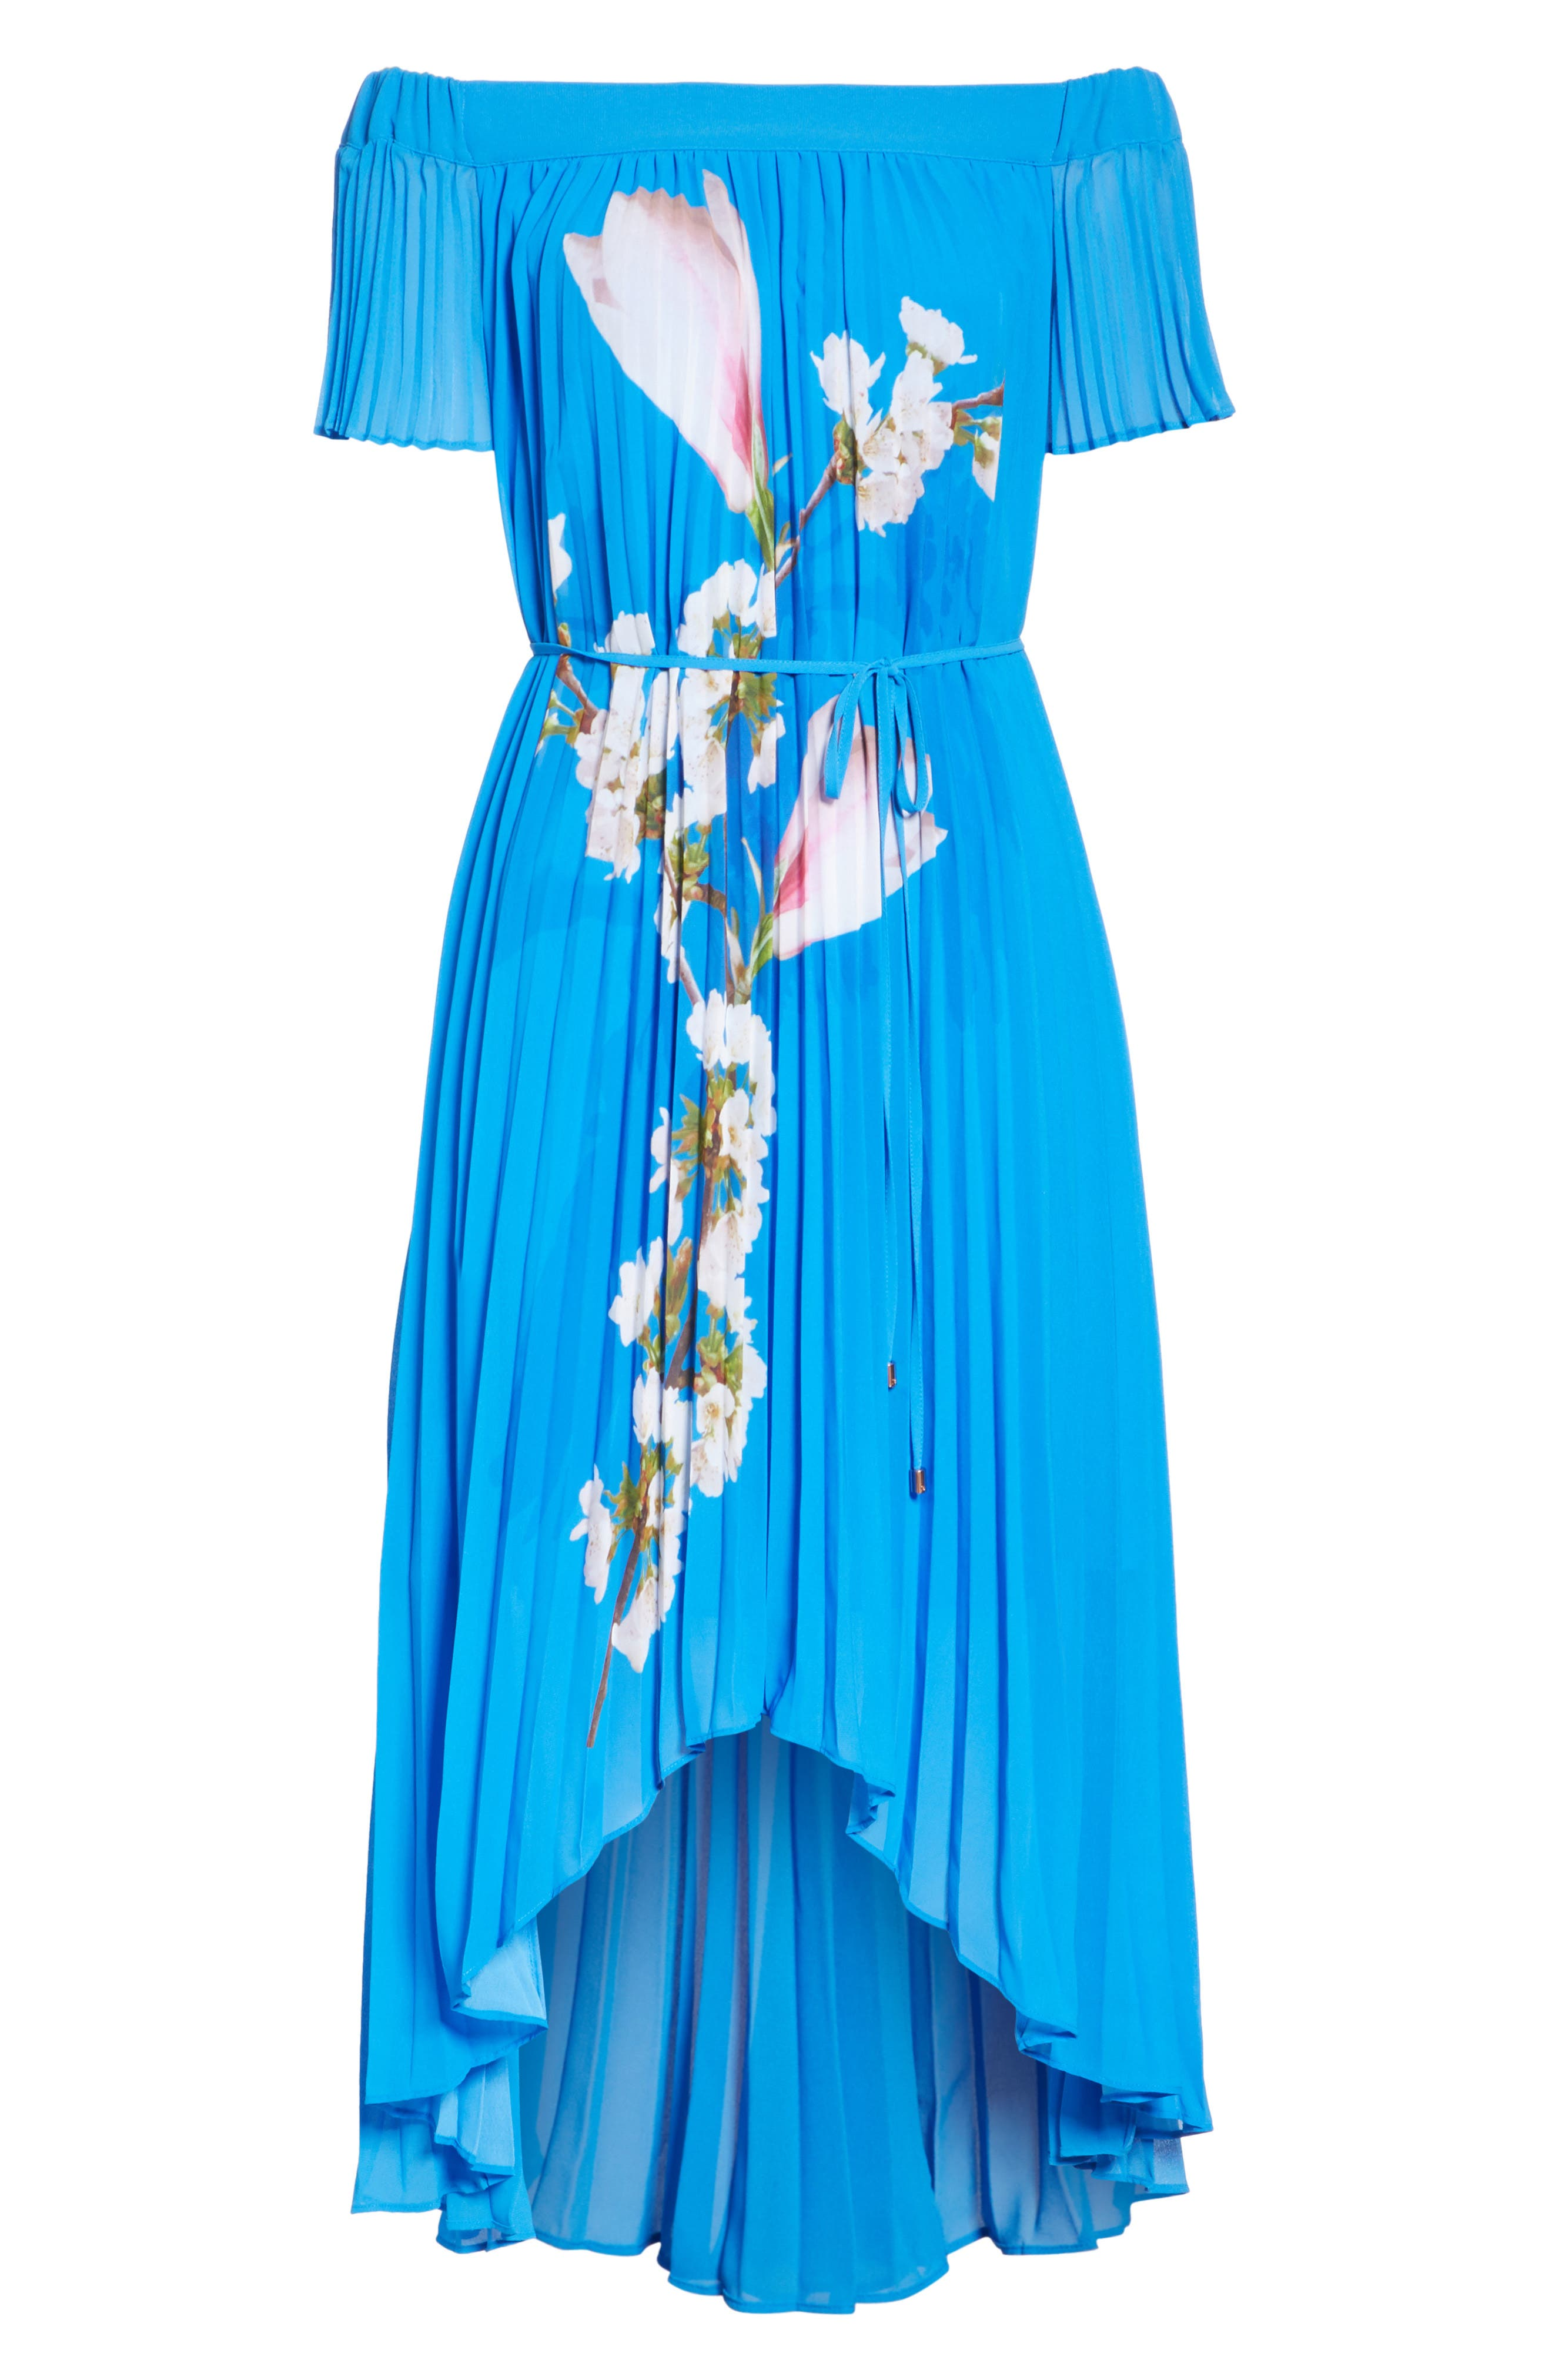 Harmony Pleat High/Low Dress,                             Alternate thumbnail 6, color,                             430